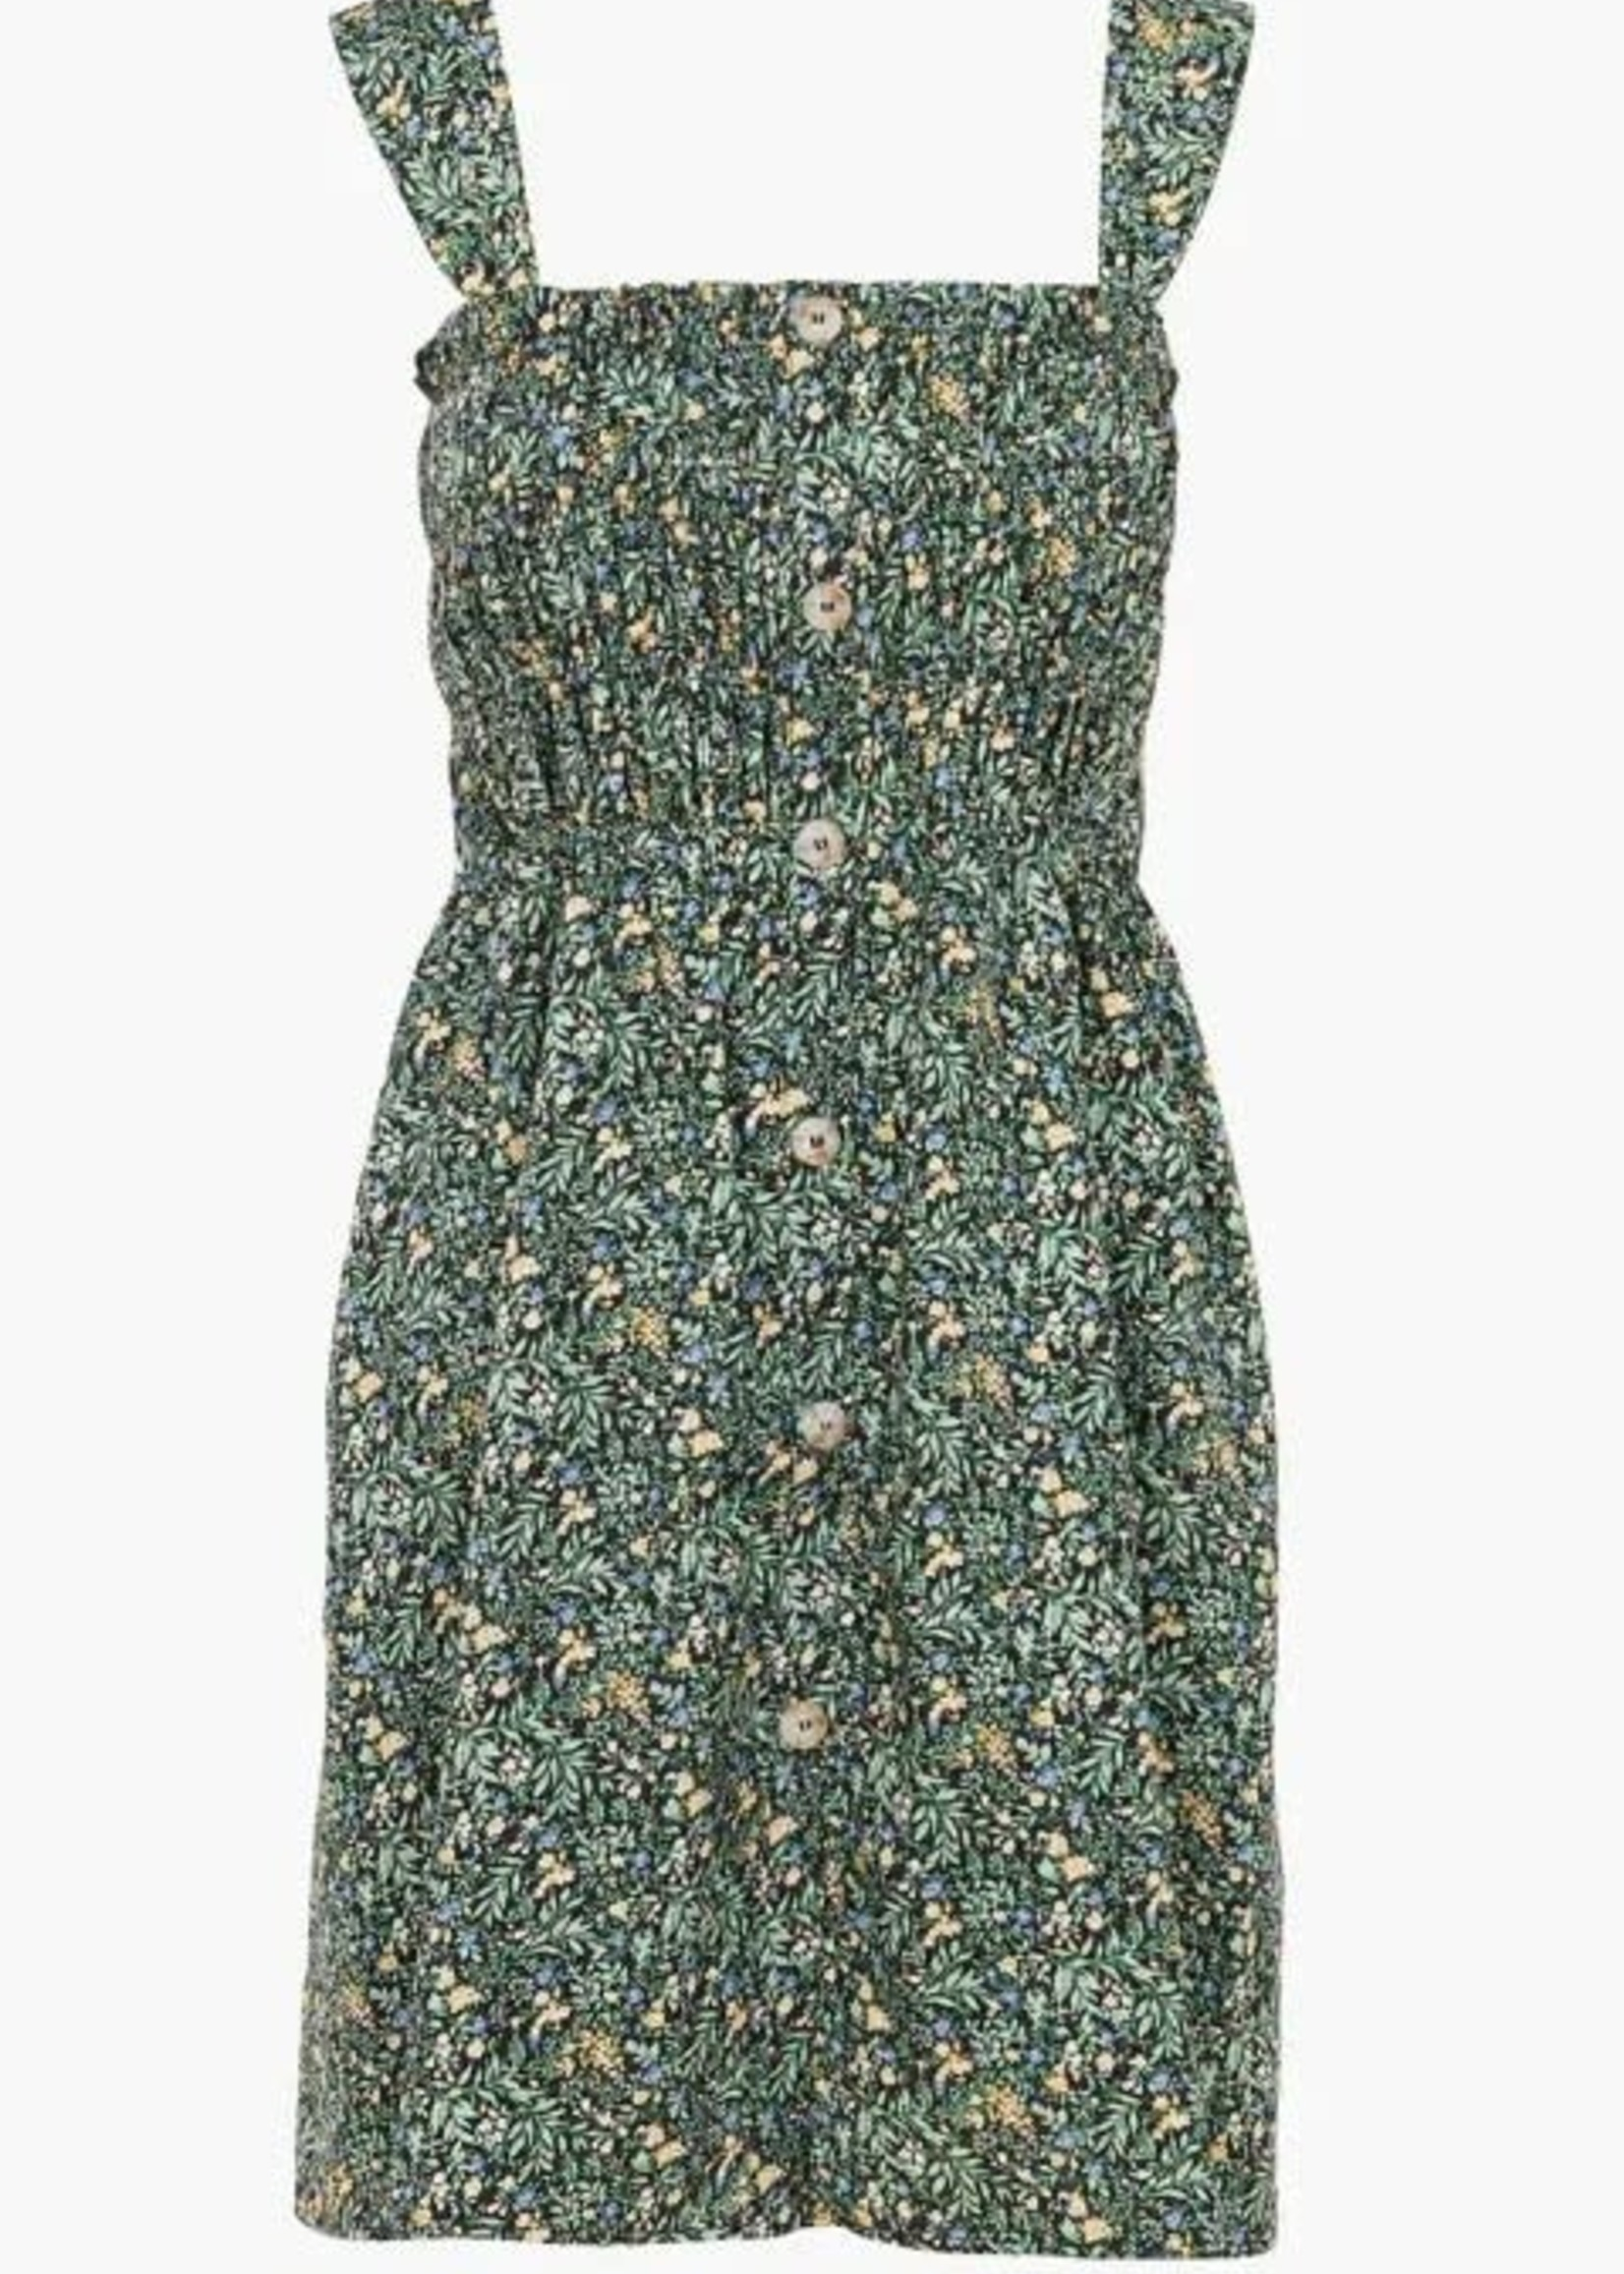 The Korner 21123038 Dress